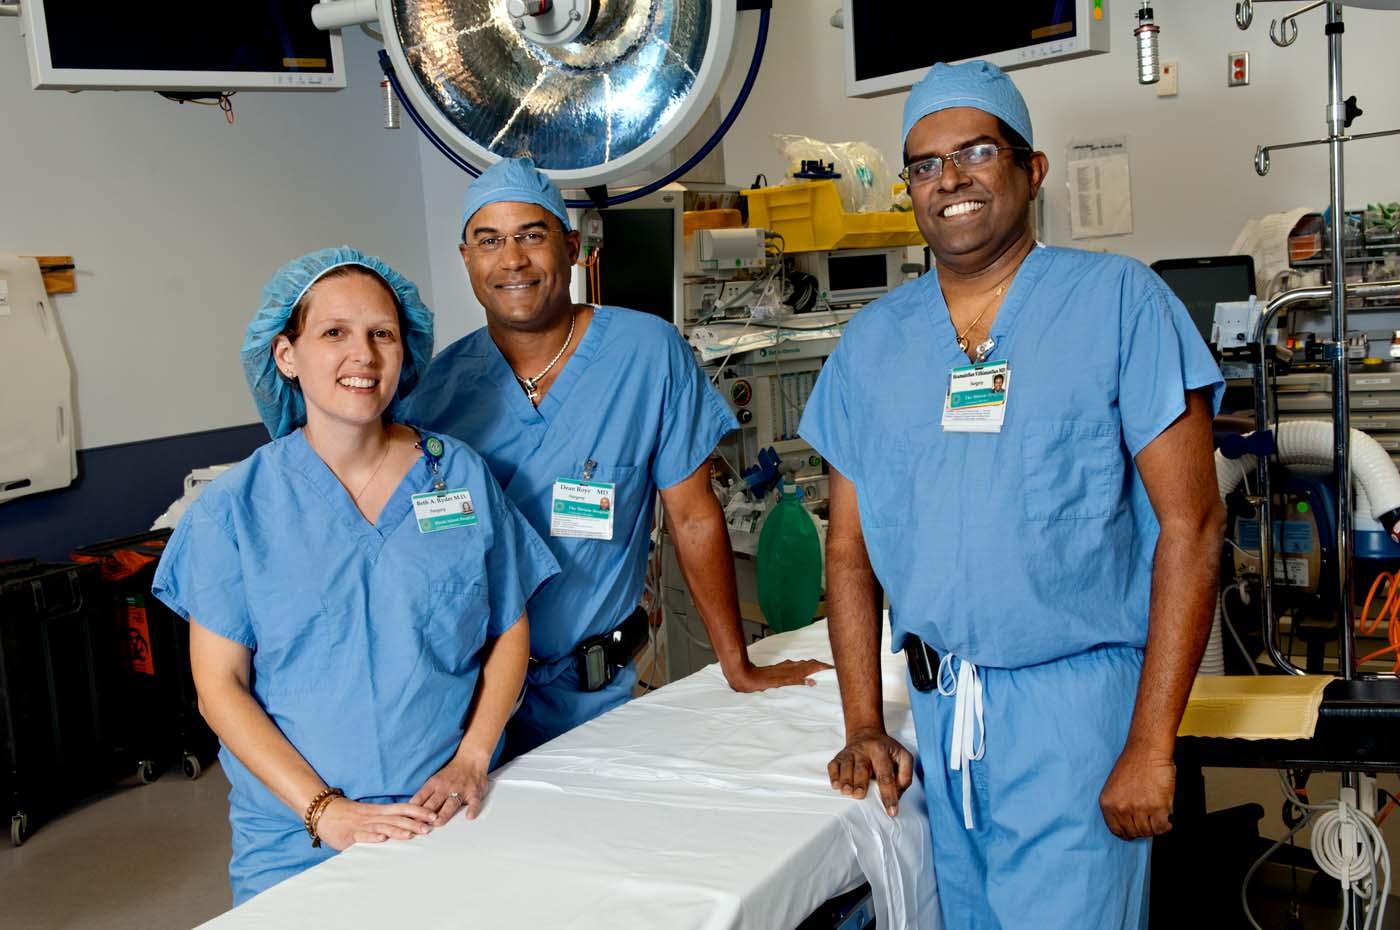 Weight Loss Surgery Rhode Island - Brown Surgical Associates - weight loss - Bariatric Surgery near me - lose weight - weight loss surgery near me -  Rhode Island weight loss